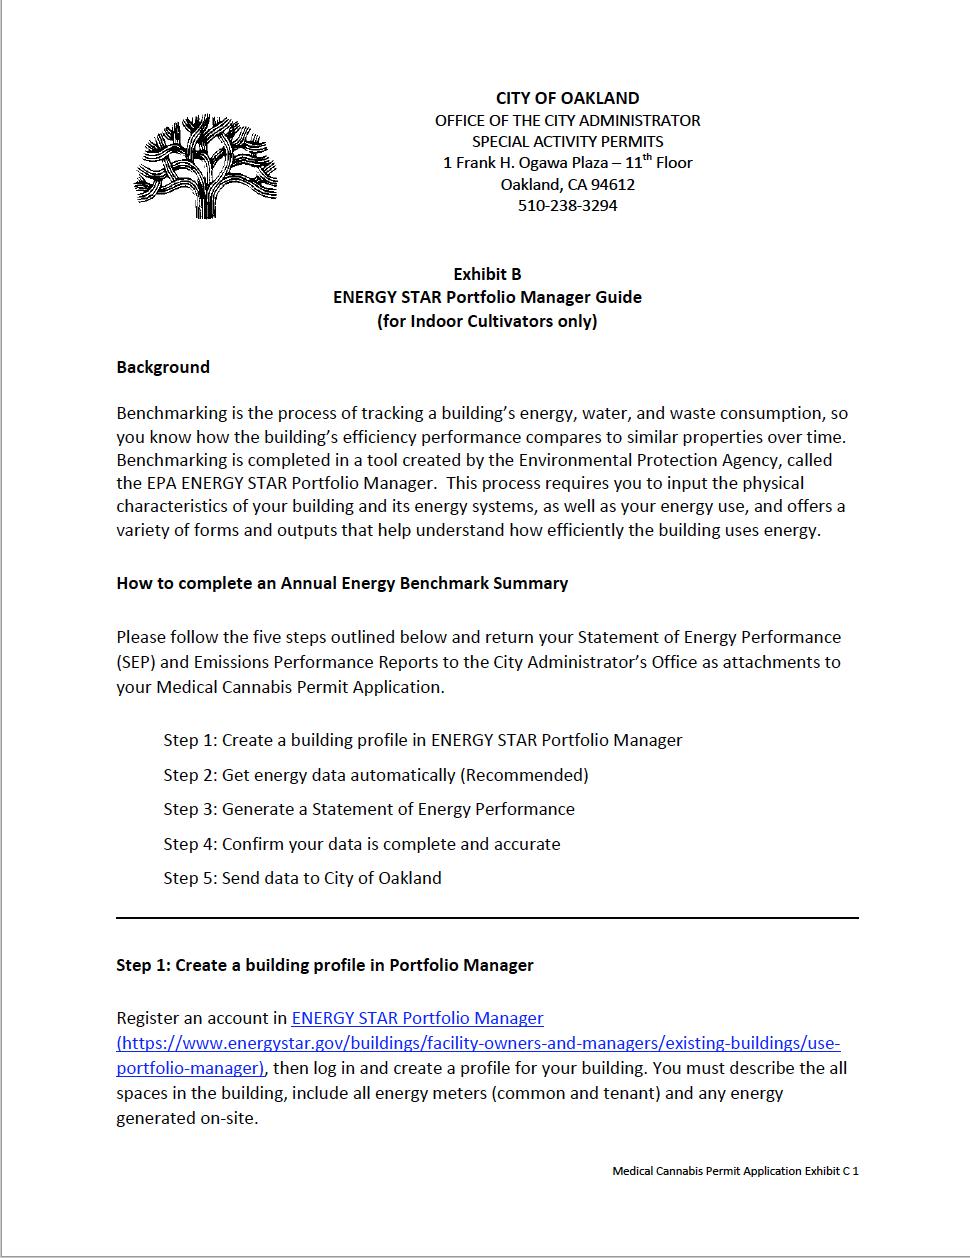 Special Activity Permits.png